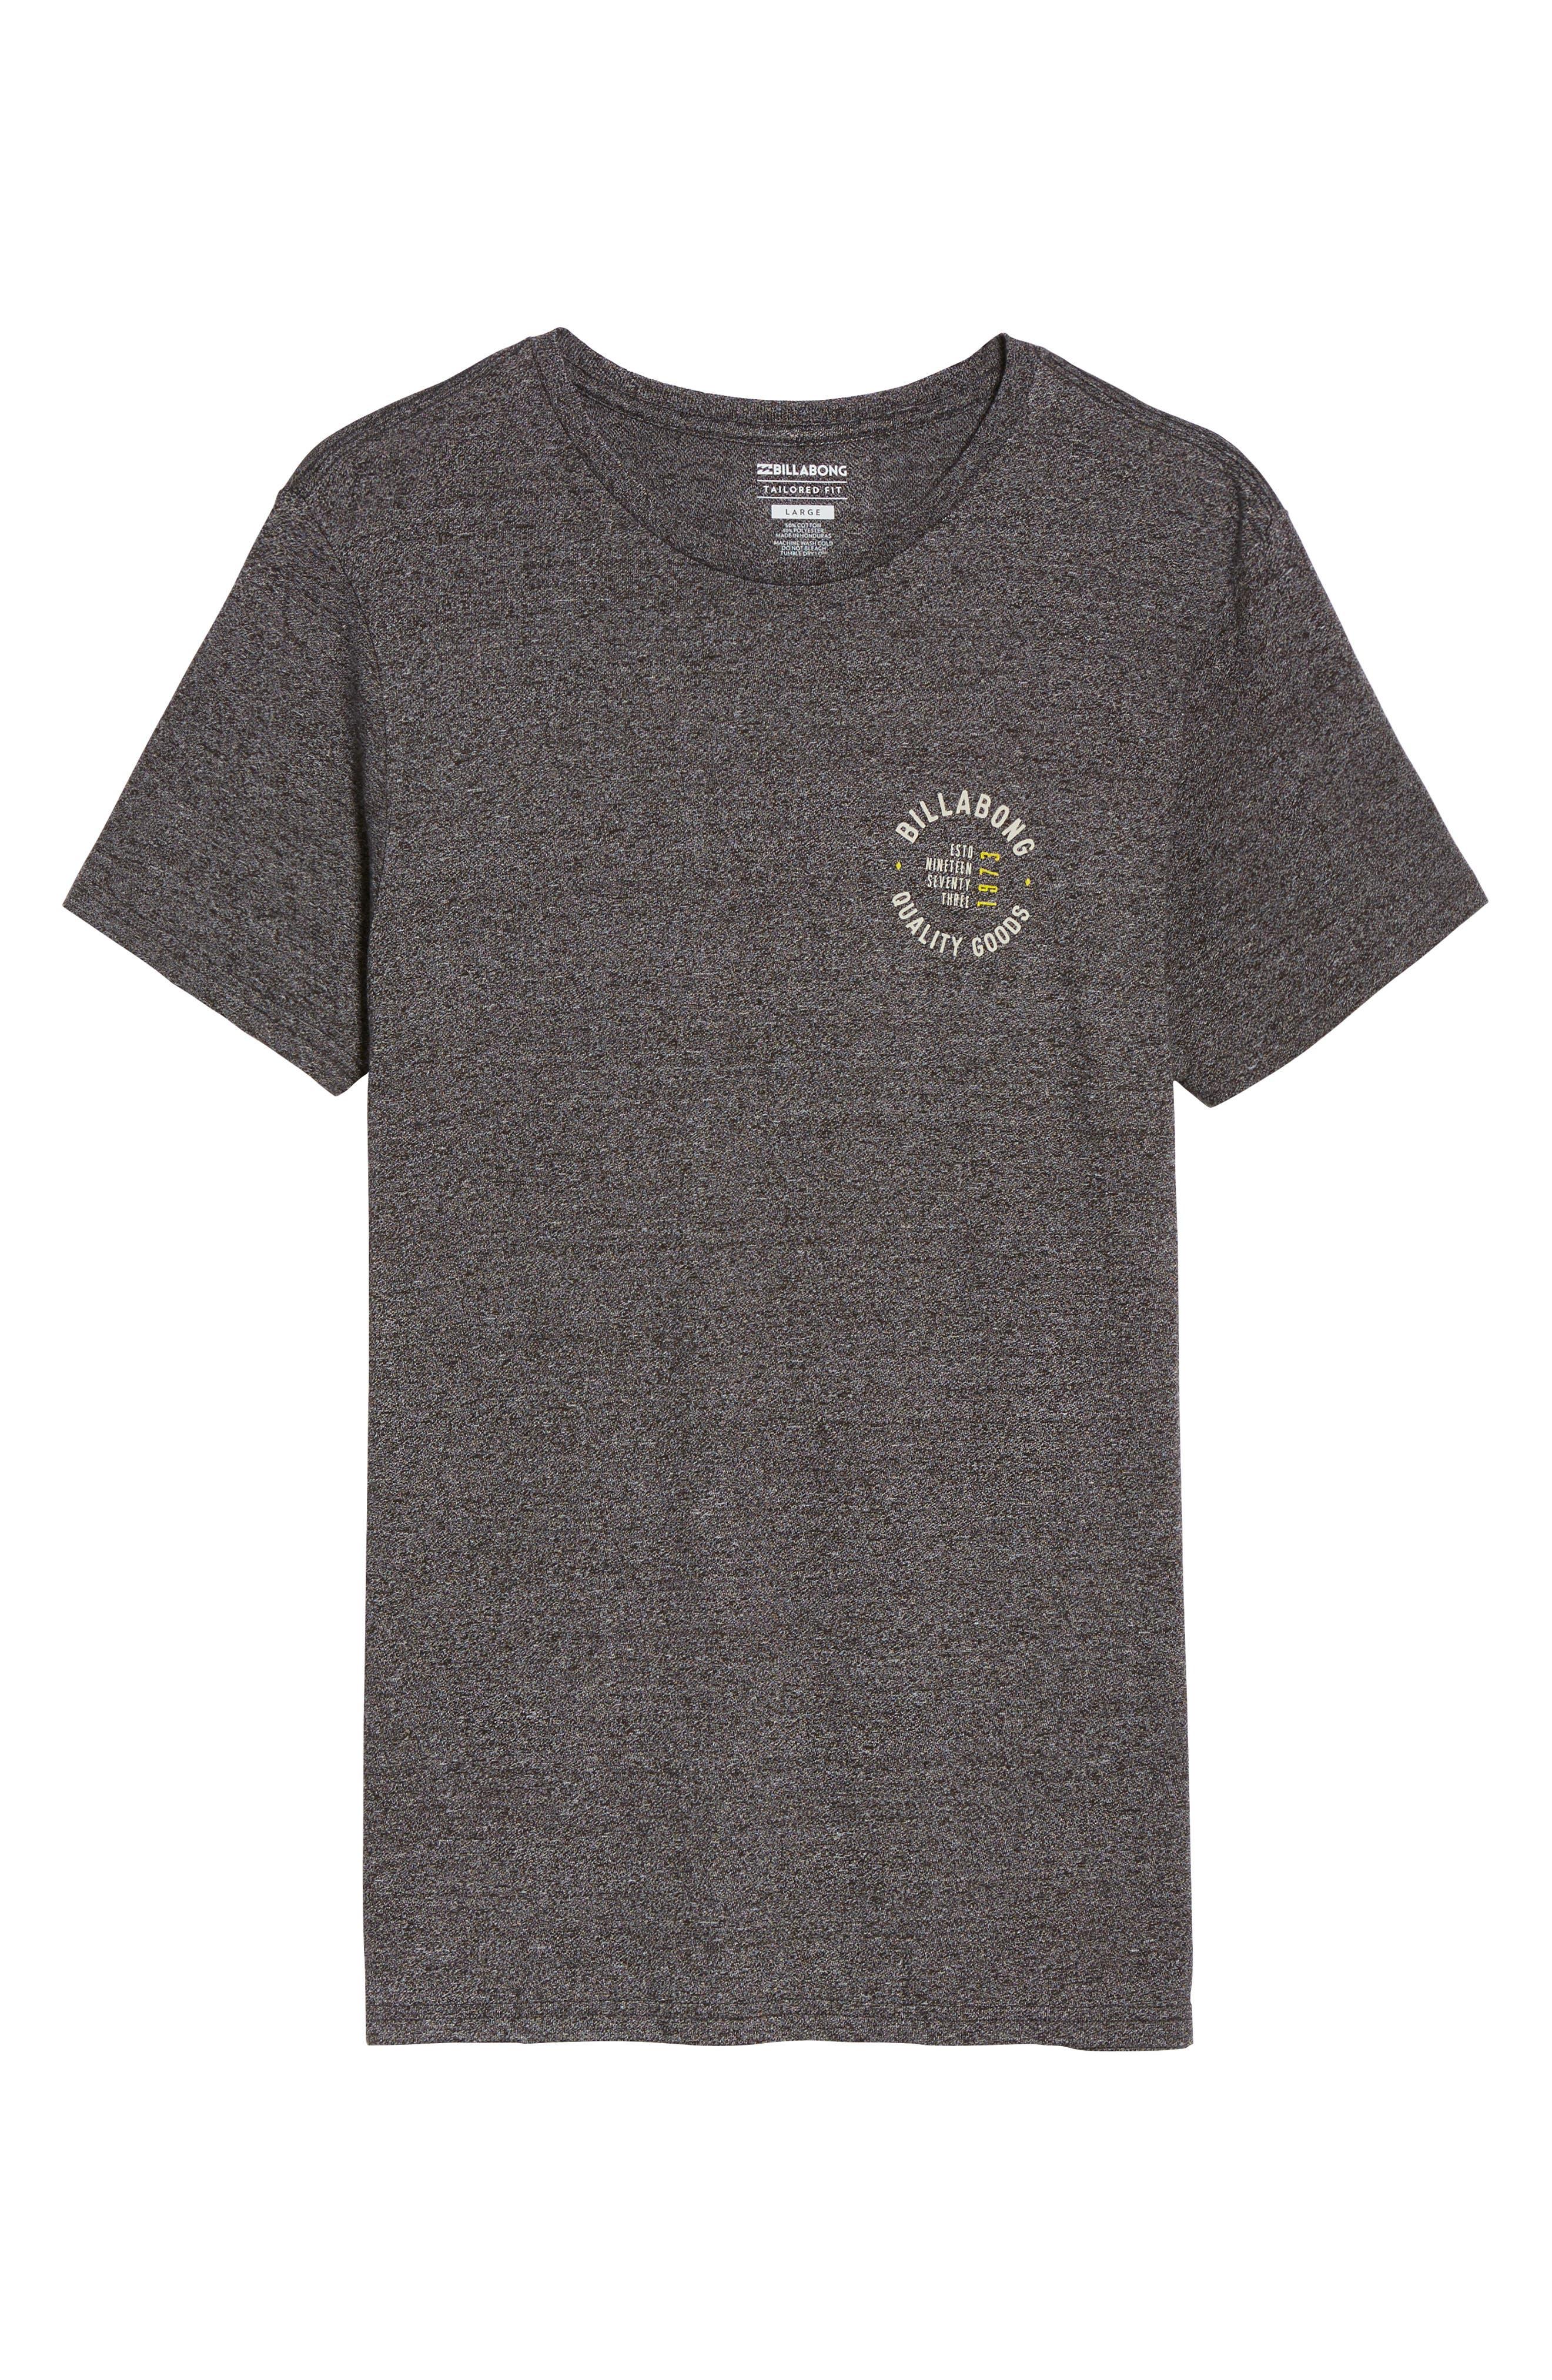 Wallace T-Shirt,                             Alternate thumbnail 6, color,                             001